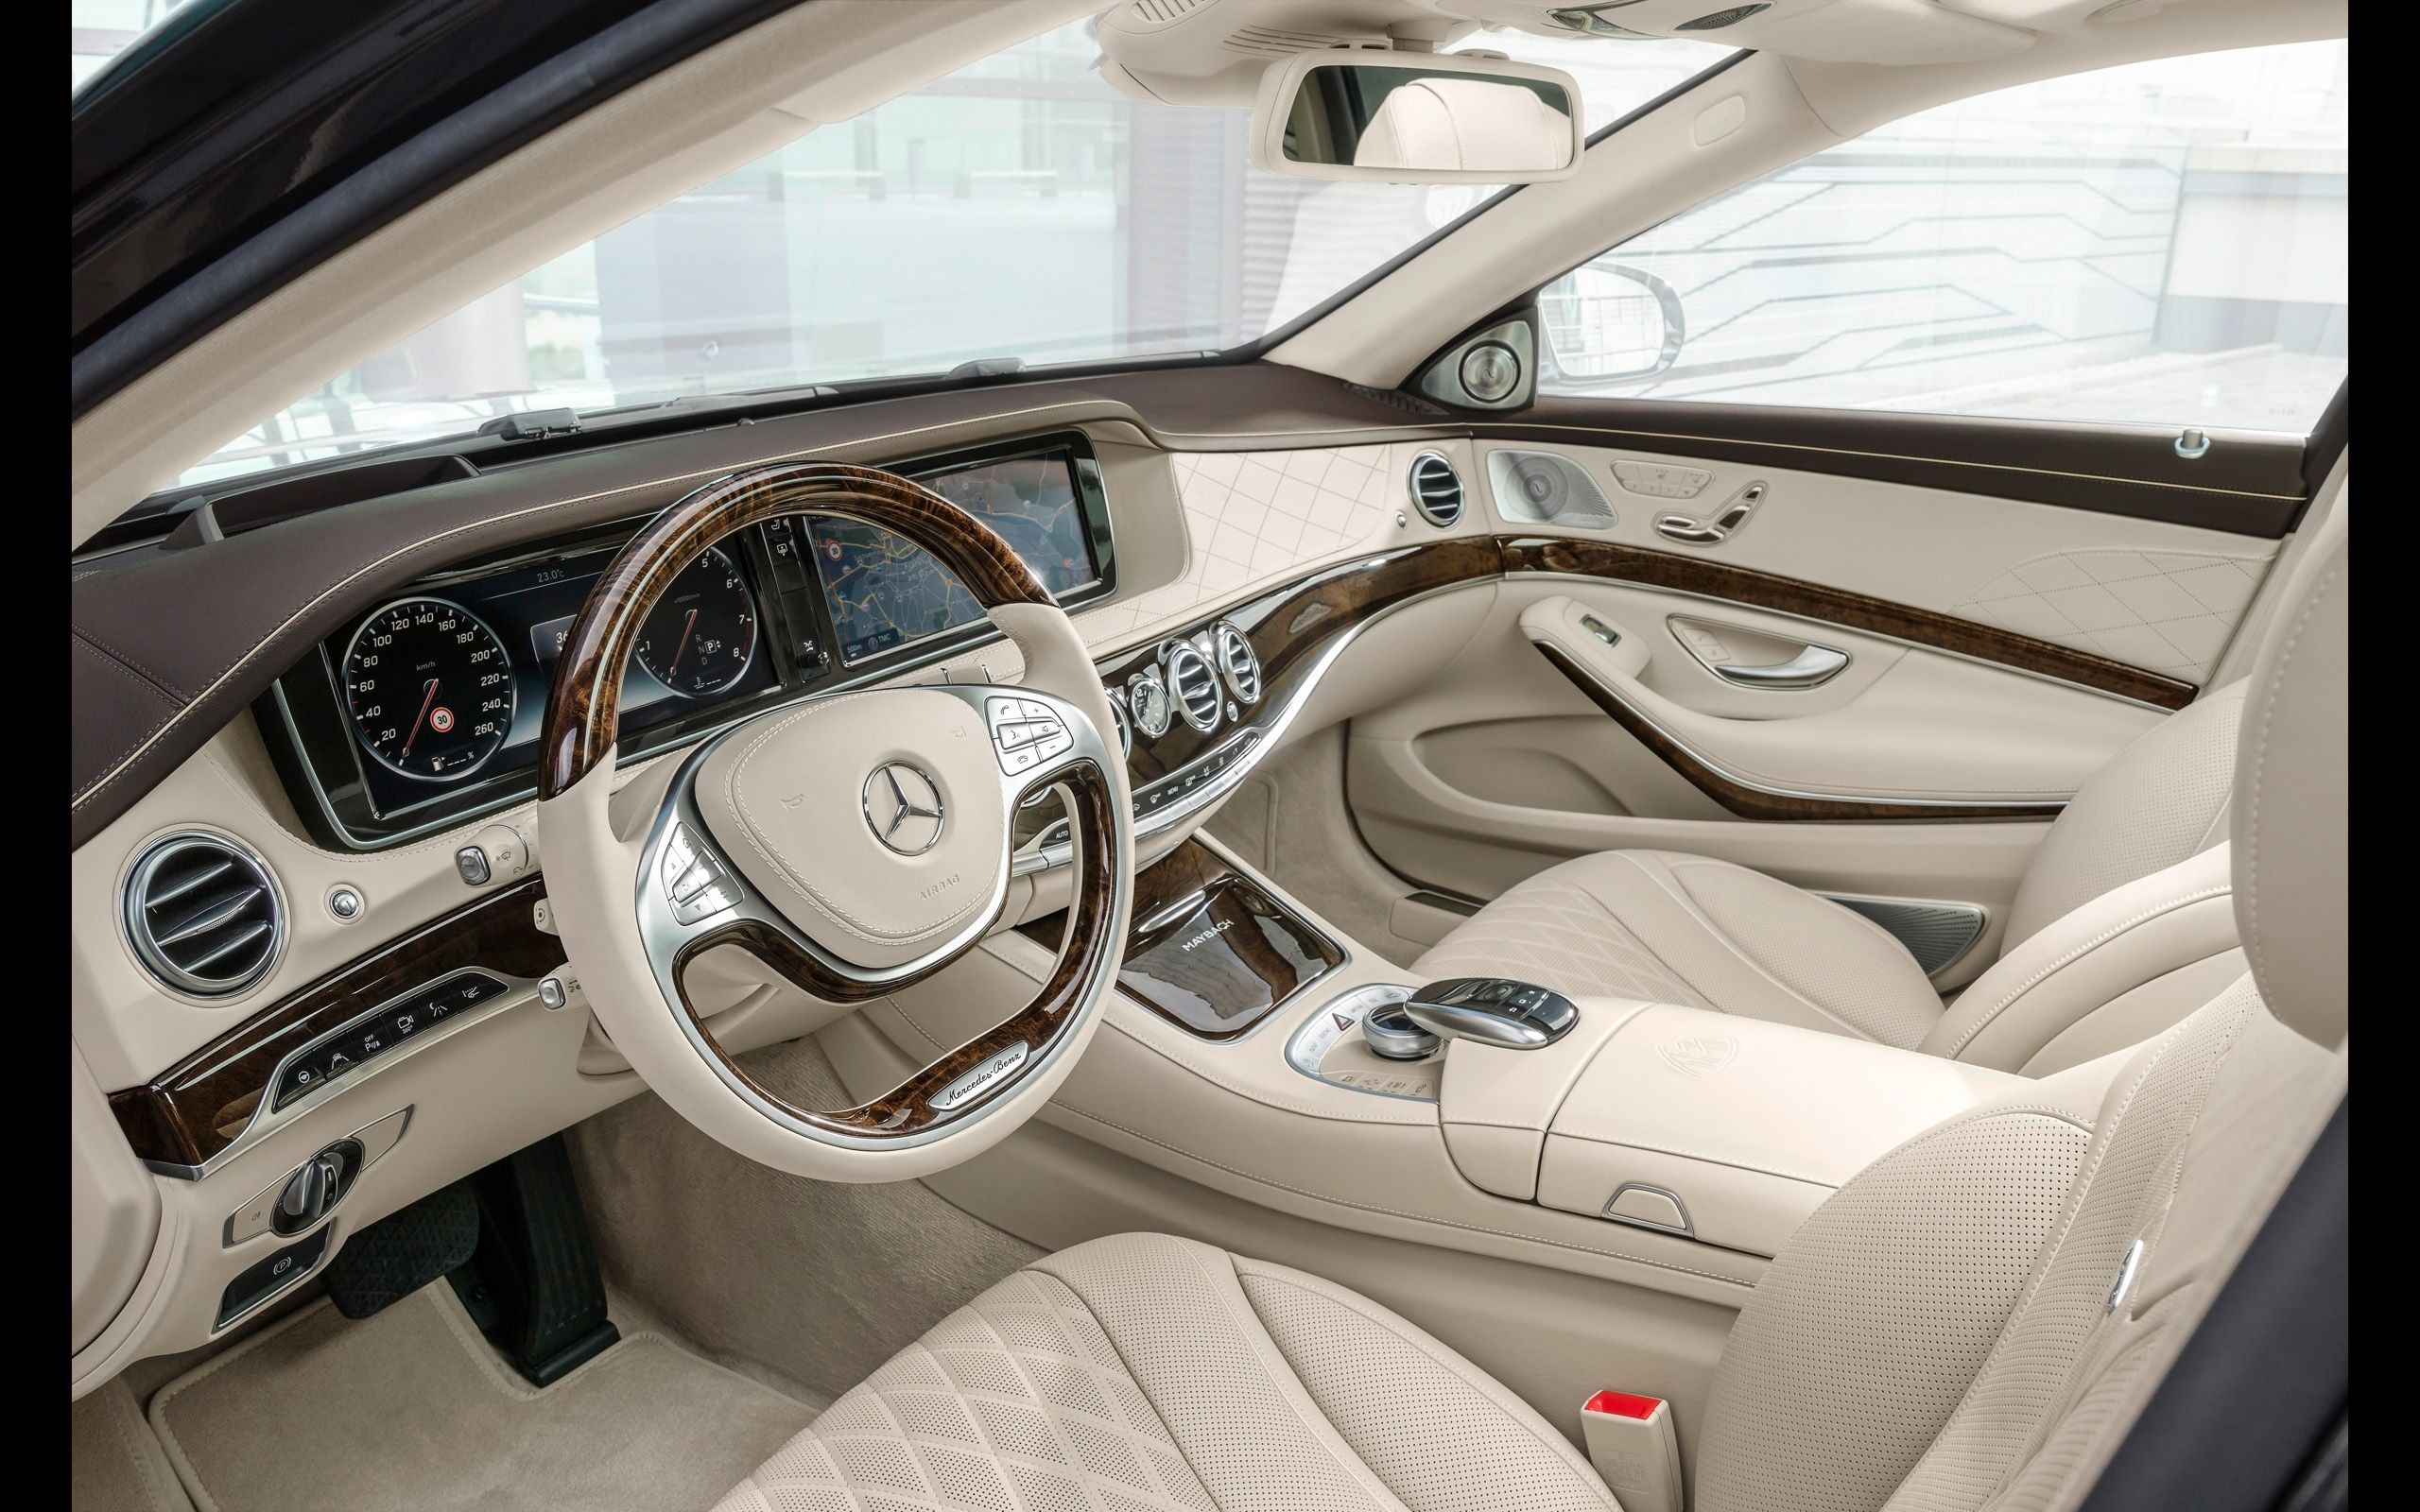 2015 Mercedes Maybach S Class Interior 13 2560x1600 Wallpaper Mercedes Maybach S600 Mercedes Maybach Maybach